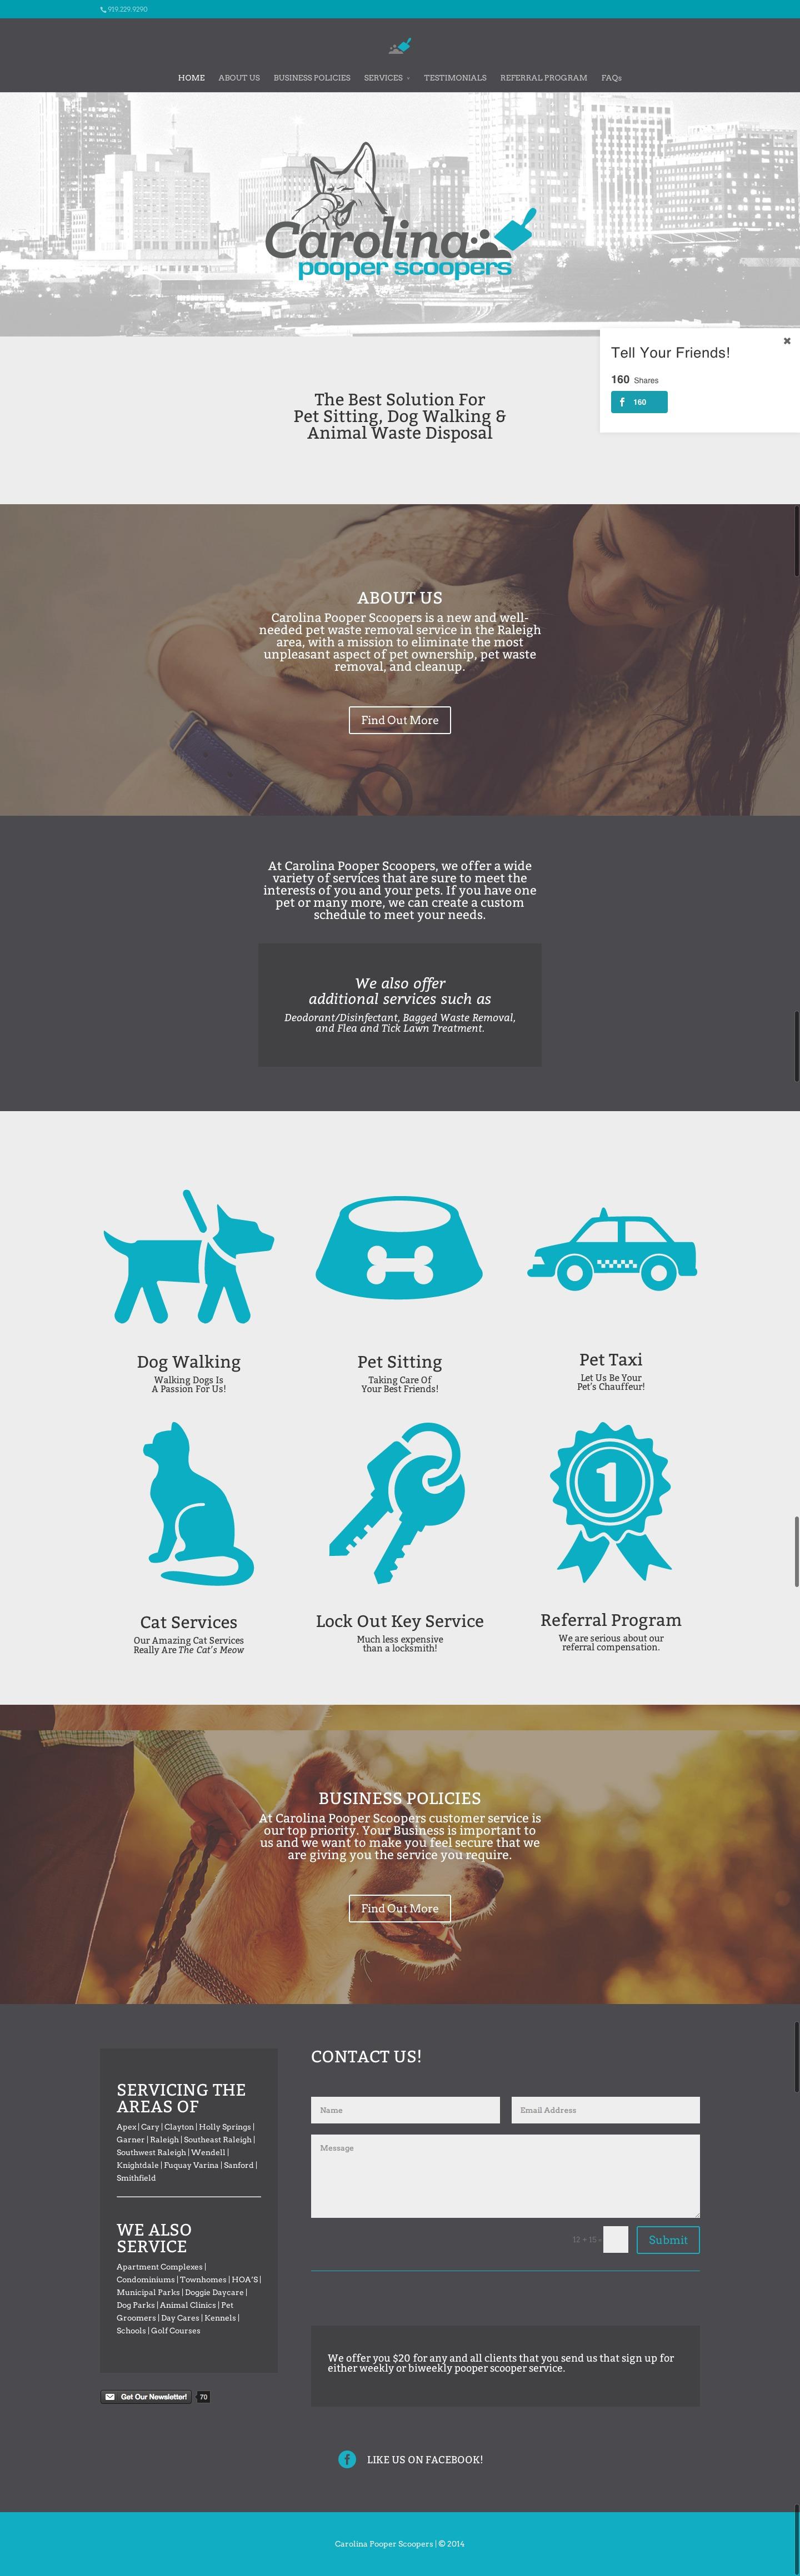 Carolina Pooper Scoopers Website Design Pooper Scooper Design Graphique